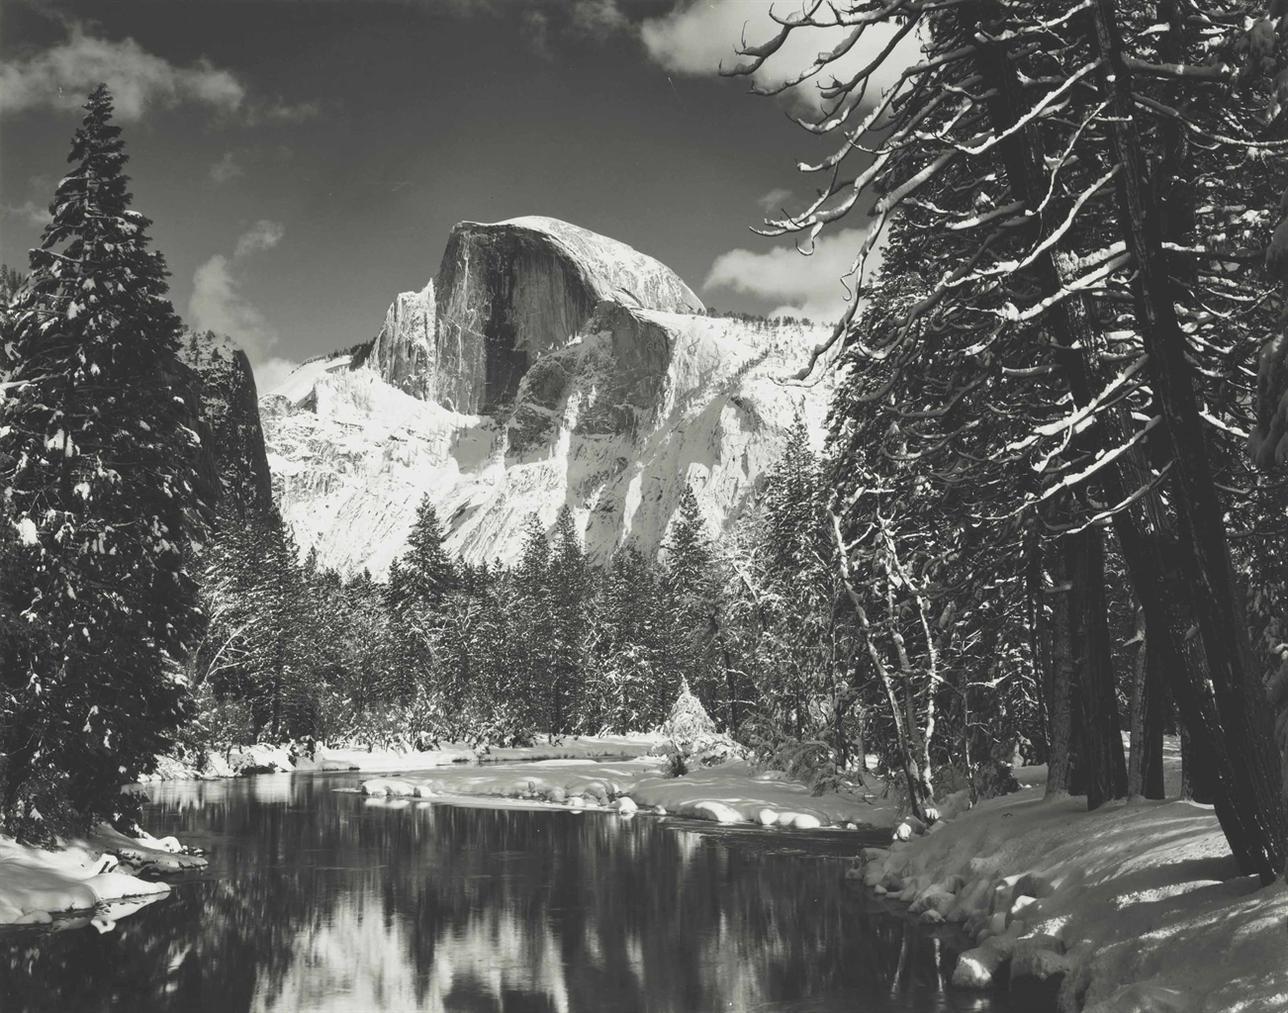 Ansel Adams-Half Dome, Merced River, Winter, Yosemite National Park, California-1938